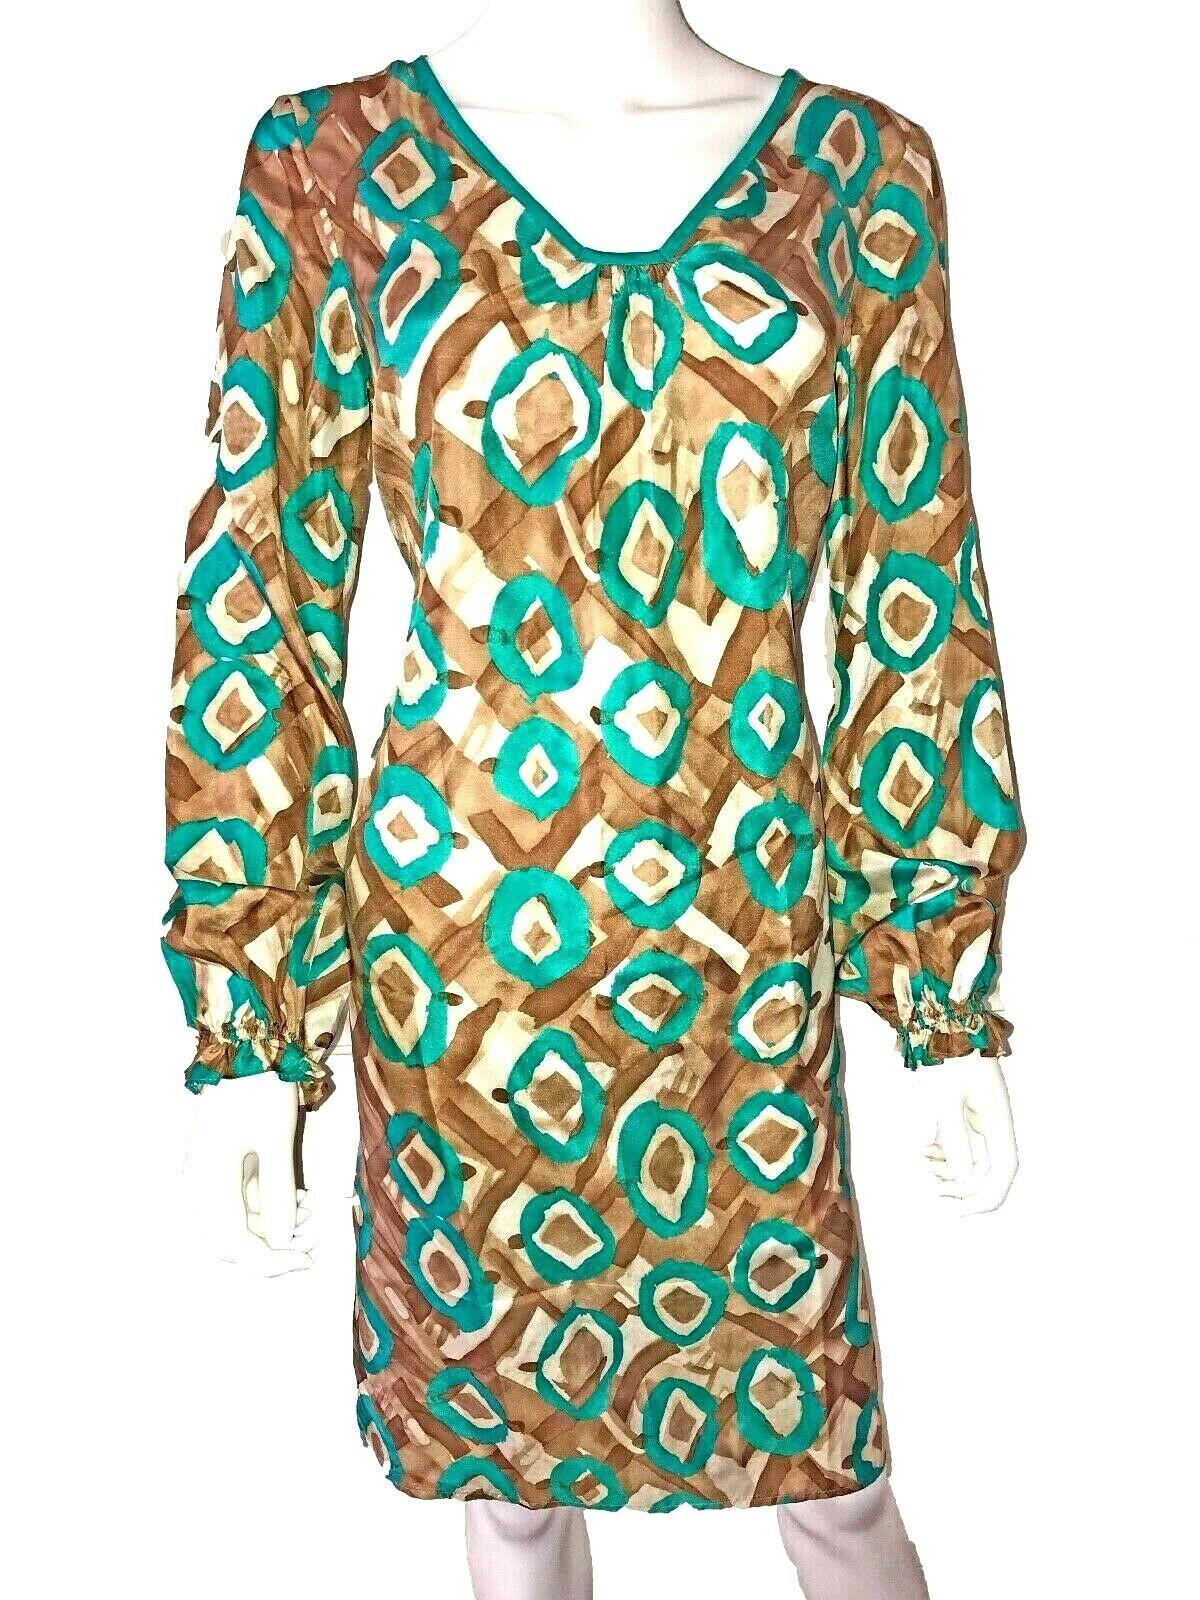 Oscar de la Renta Oscar Dress. Größe 6. Silk Polyester Teal Grün. Long-sleeves